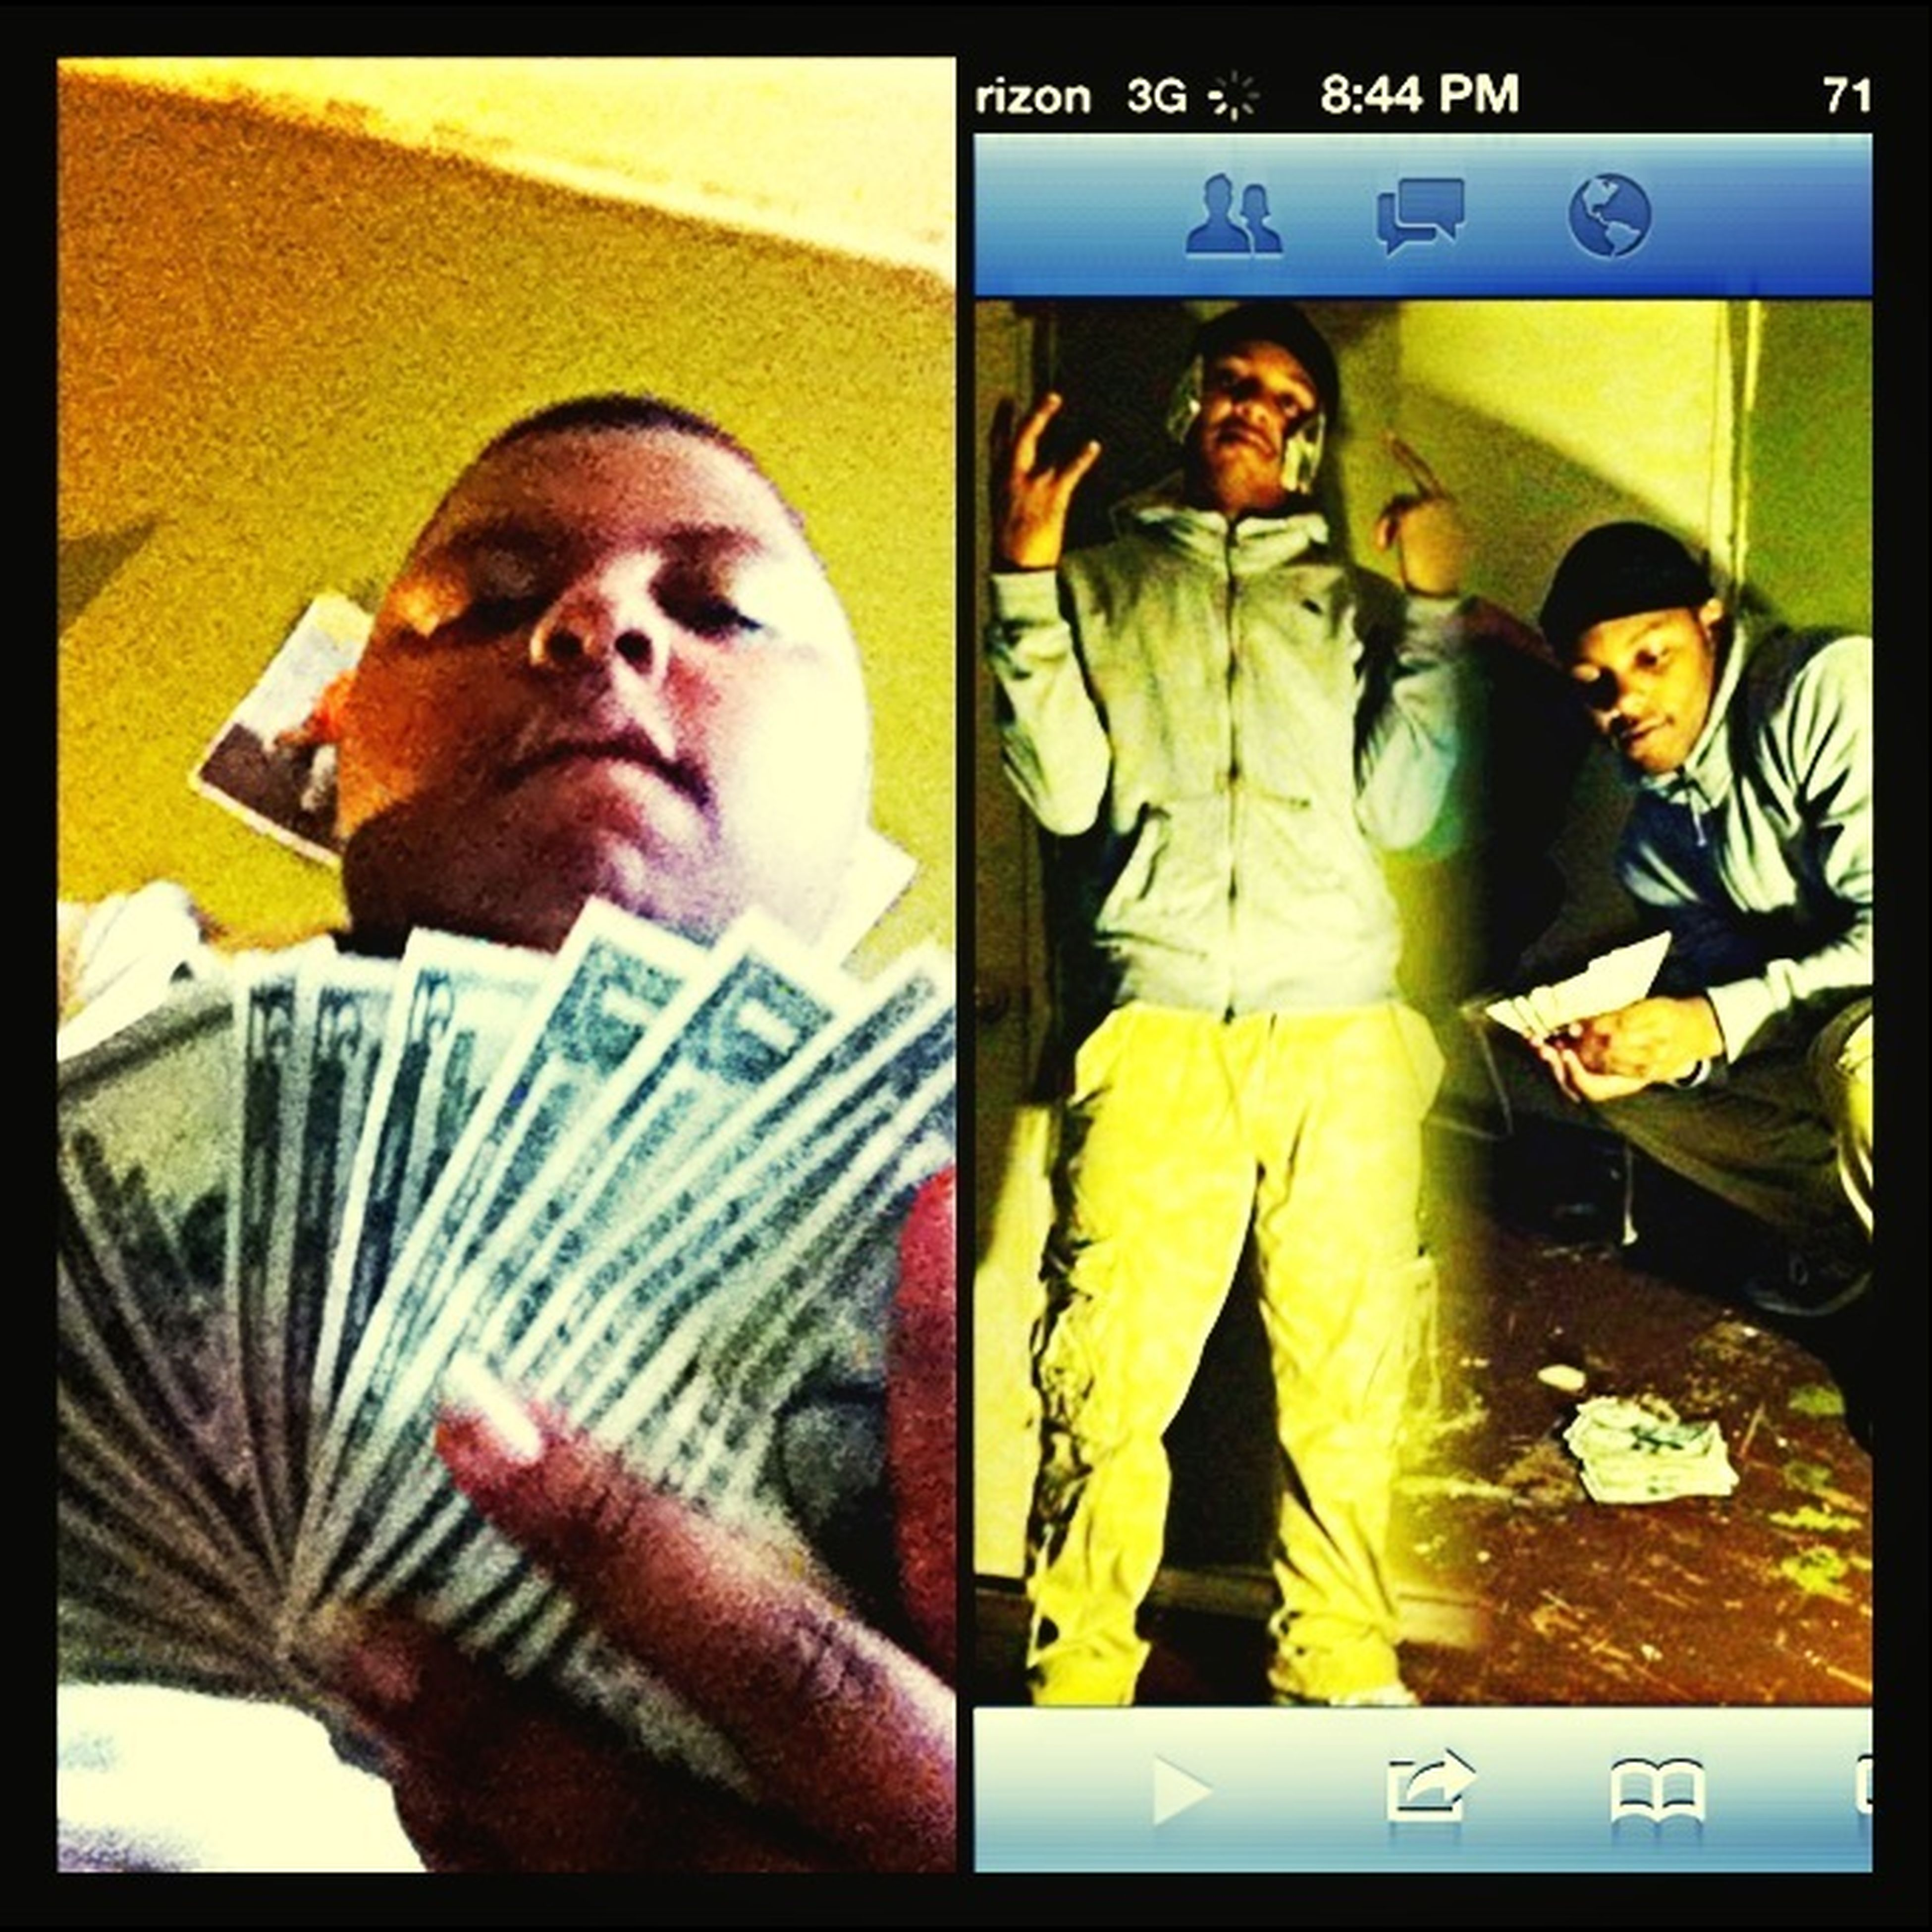 Dey Say Me And My Lil Brova Scrap Doin Number Around Da Yo